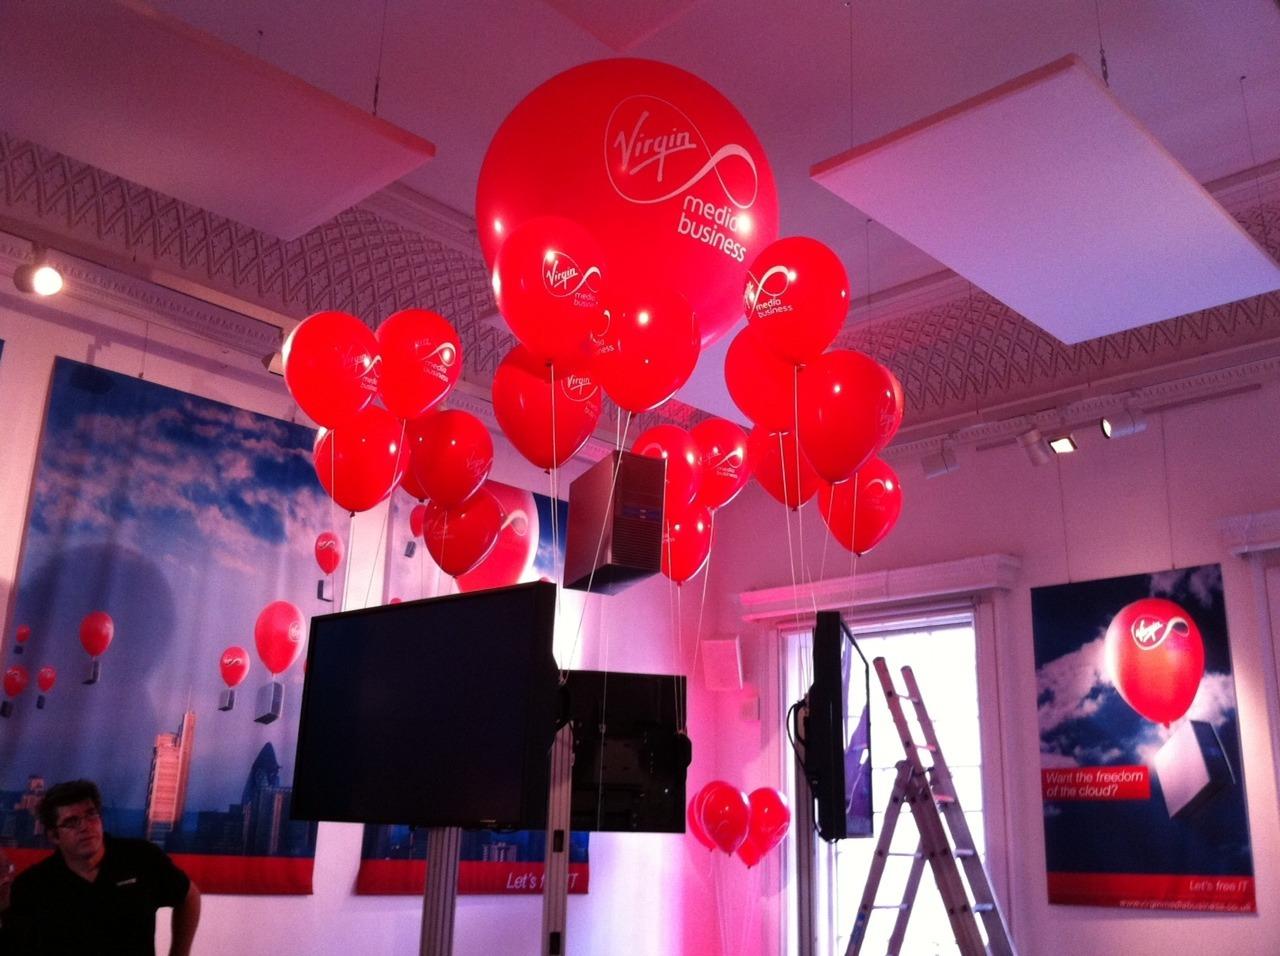 large-balloons-lifting-computers